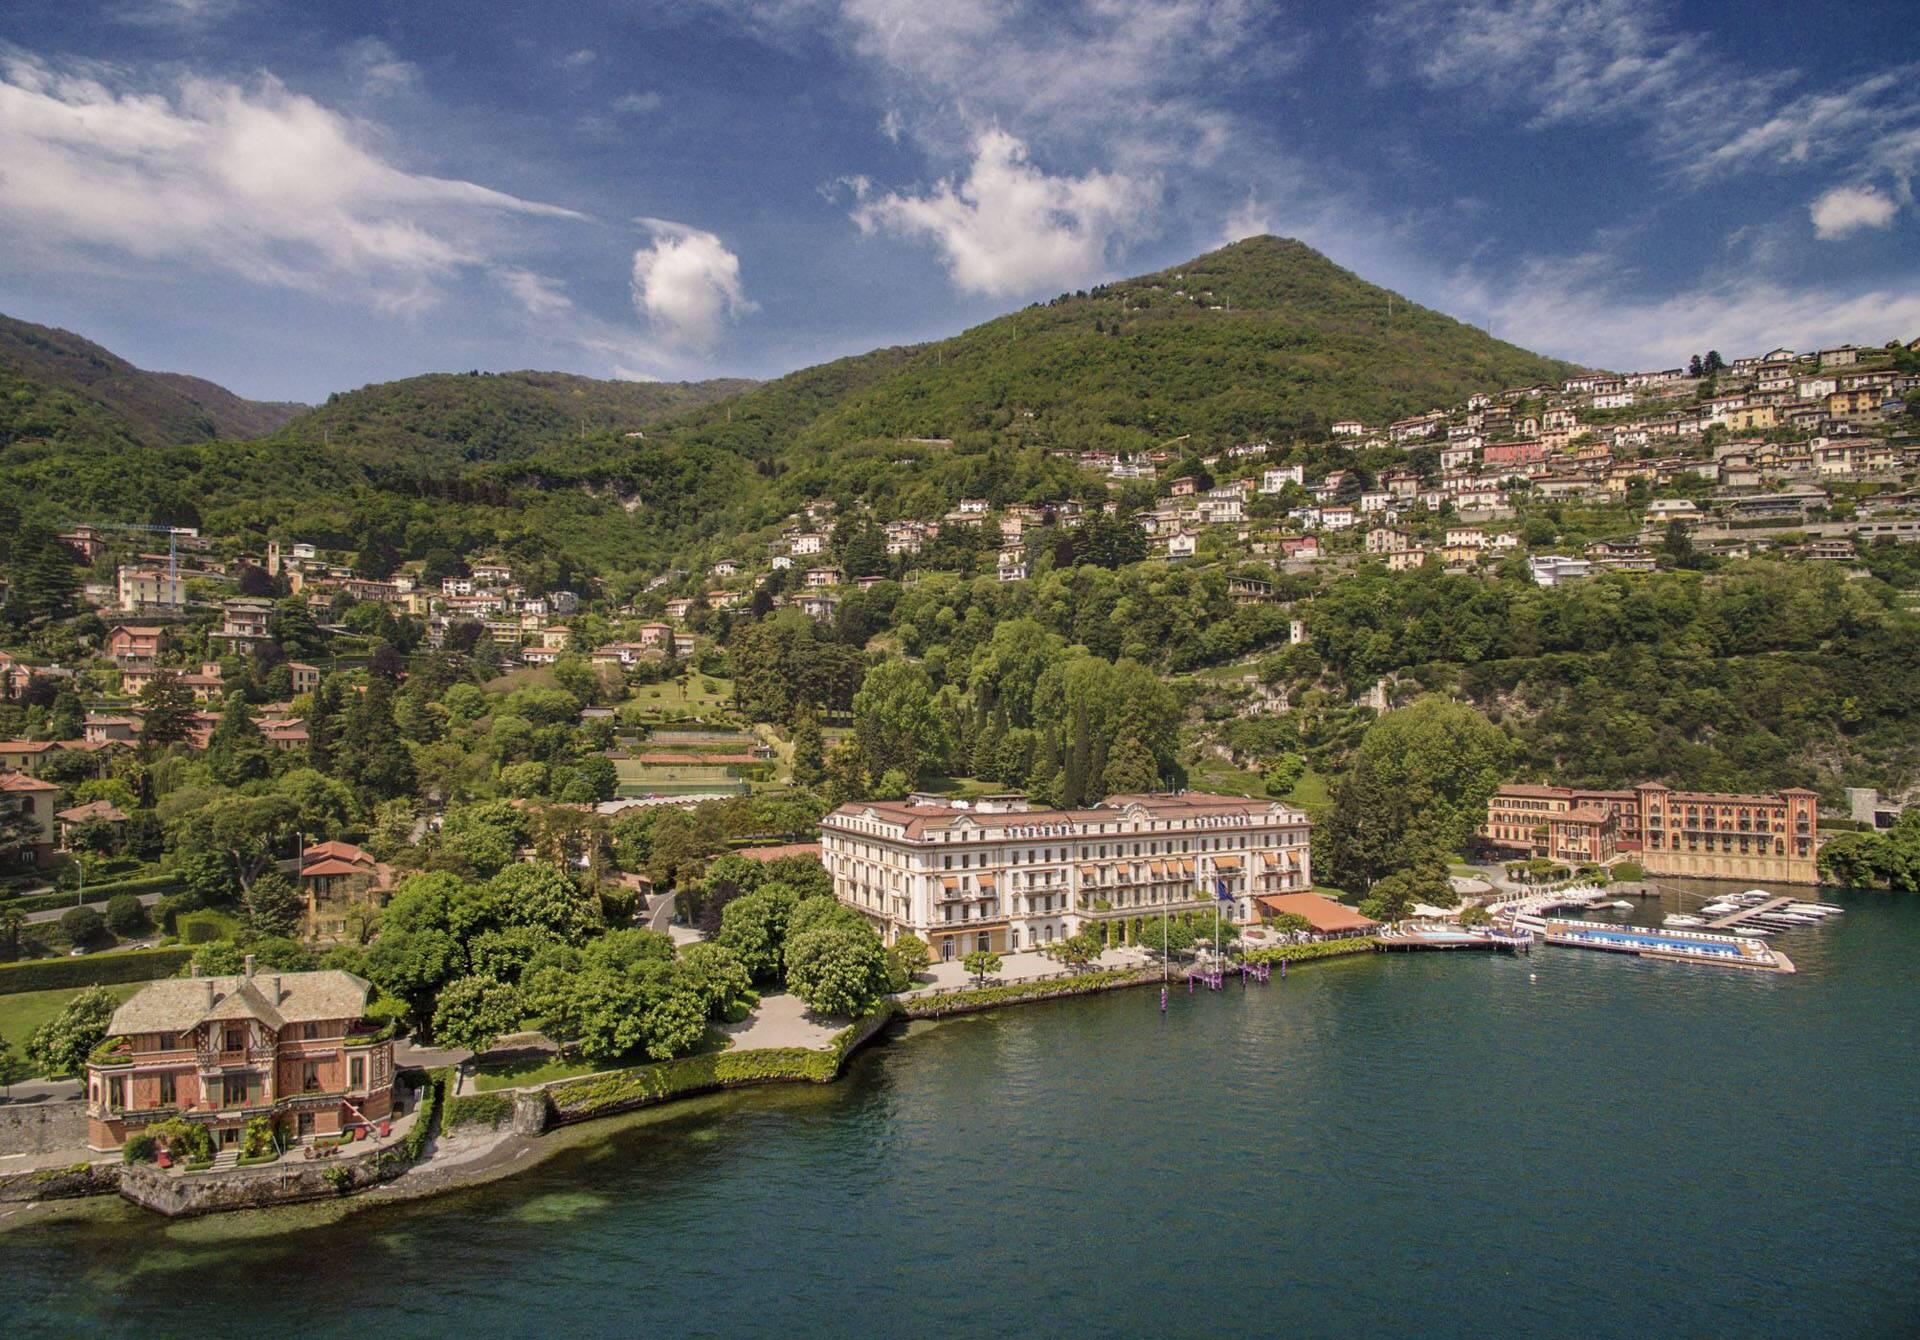 Villa Este Lac Come Vue Generale